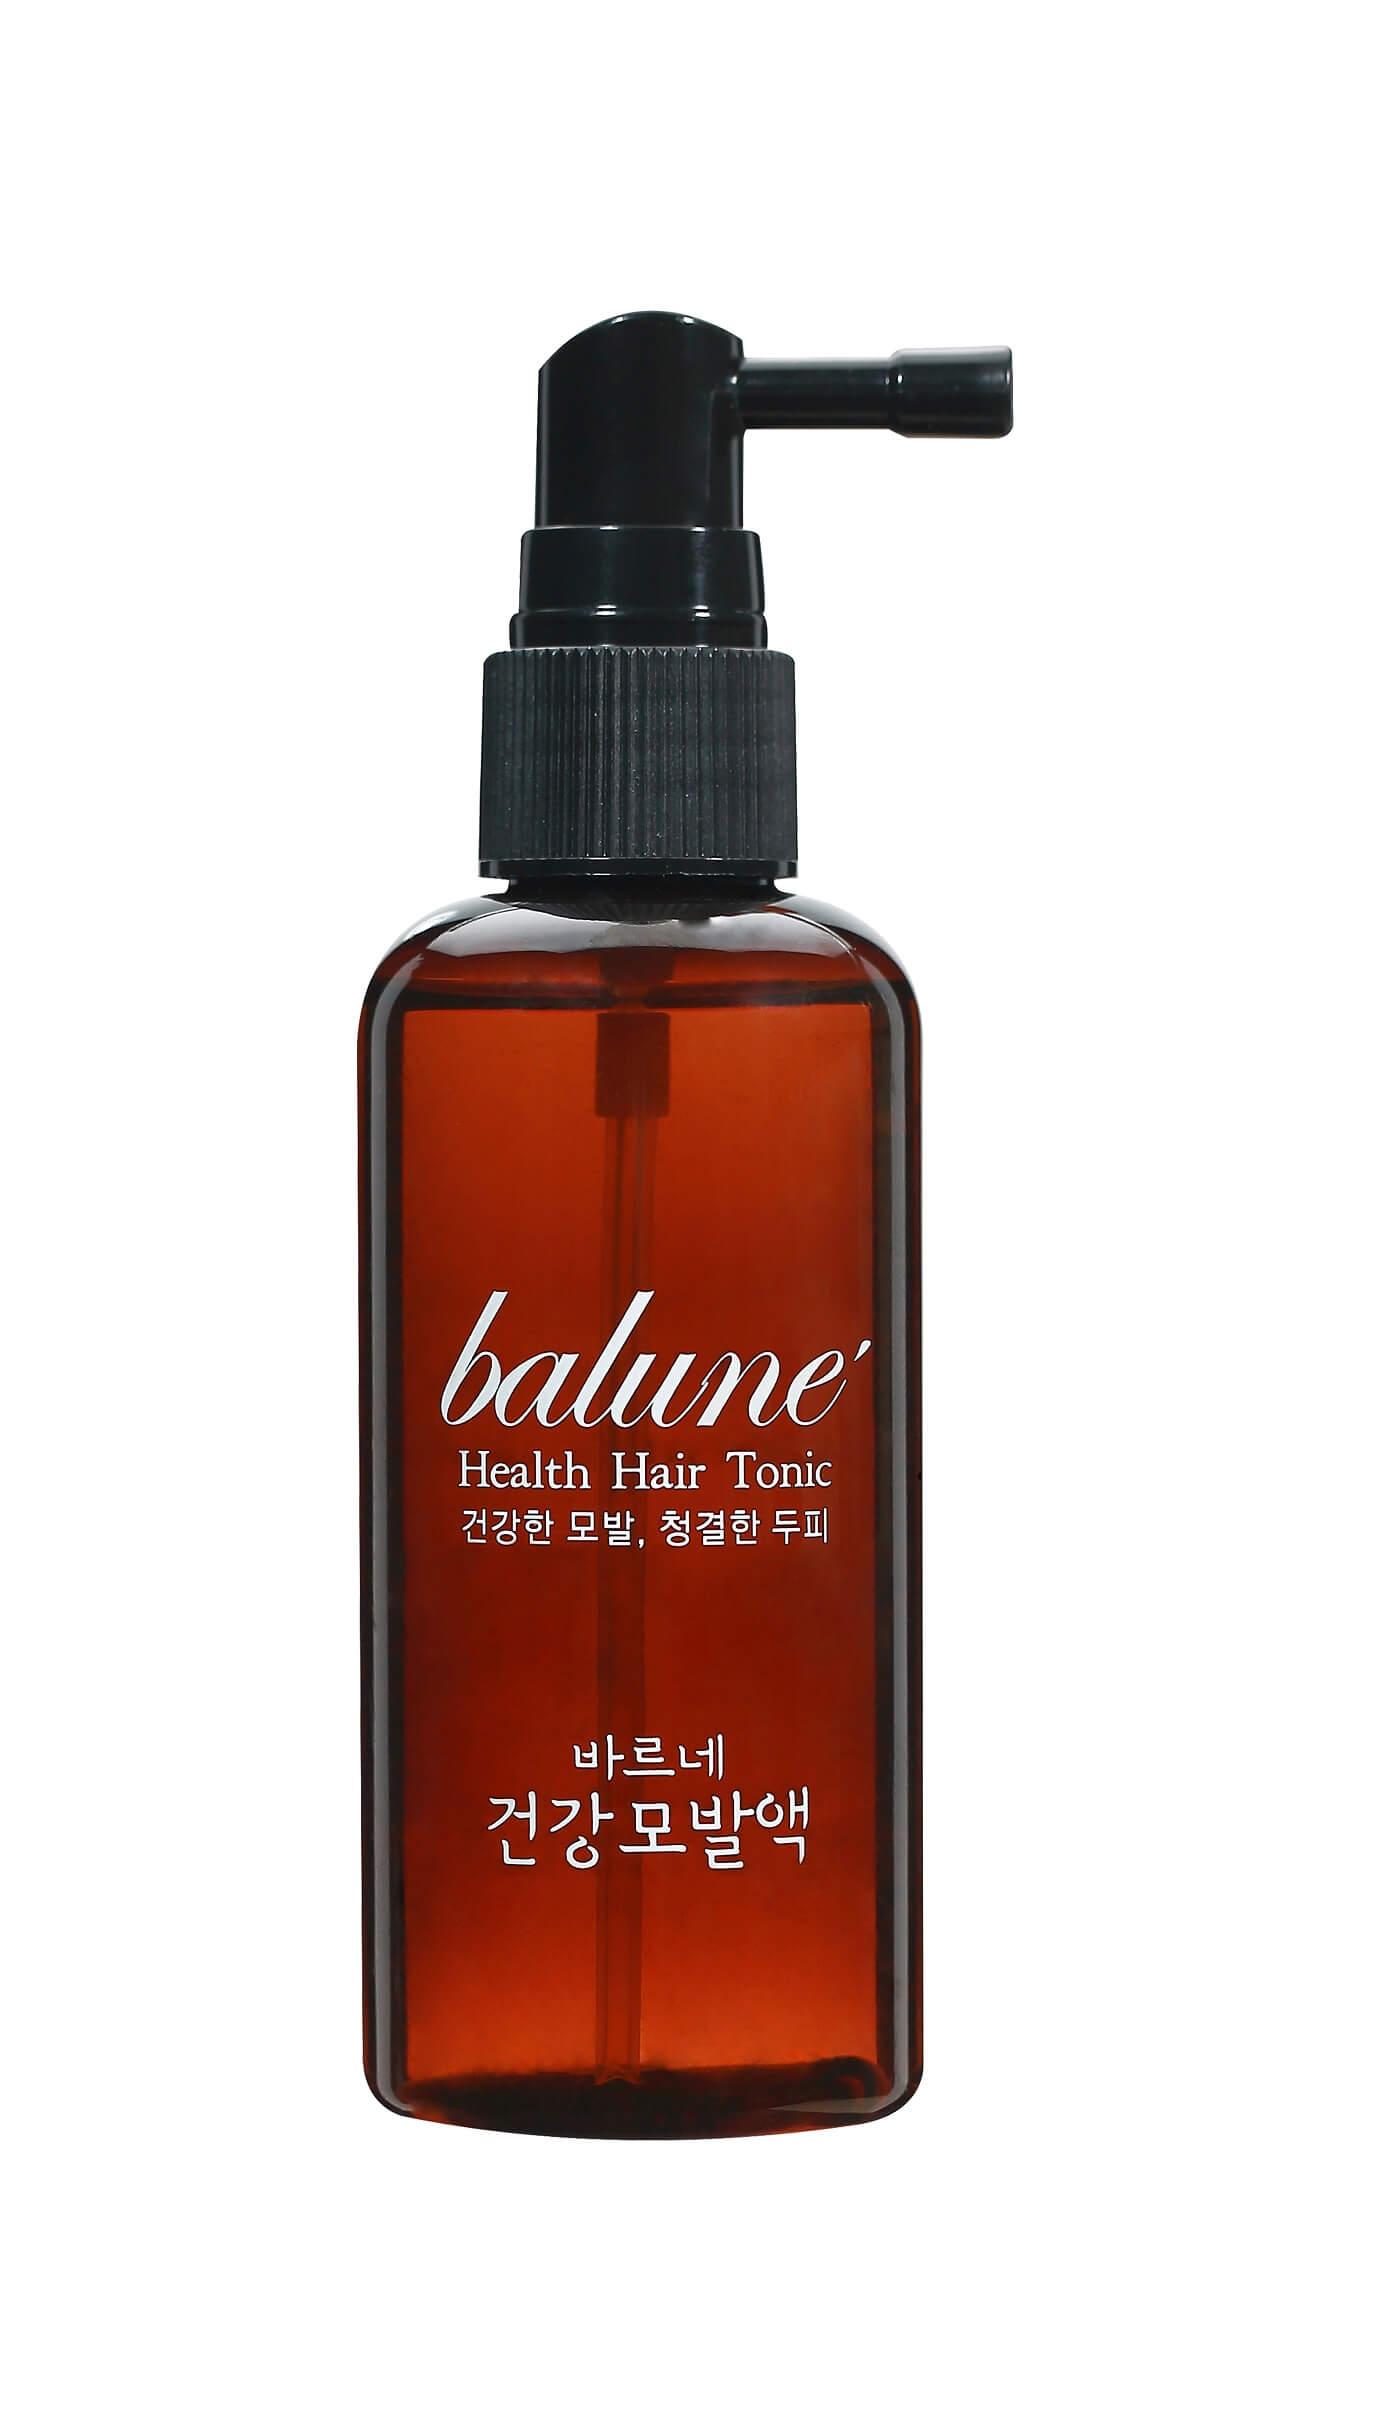 Balune Healthy Hair Tonic